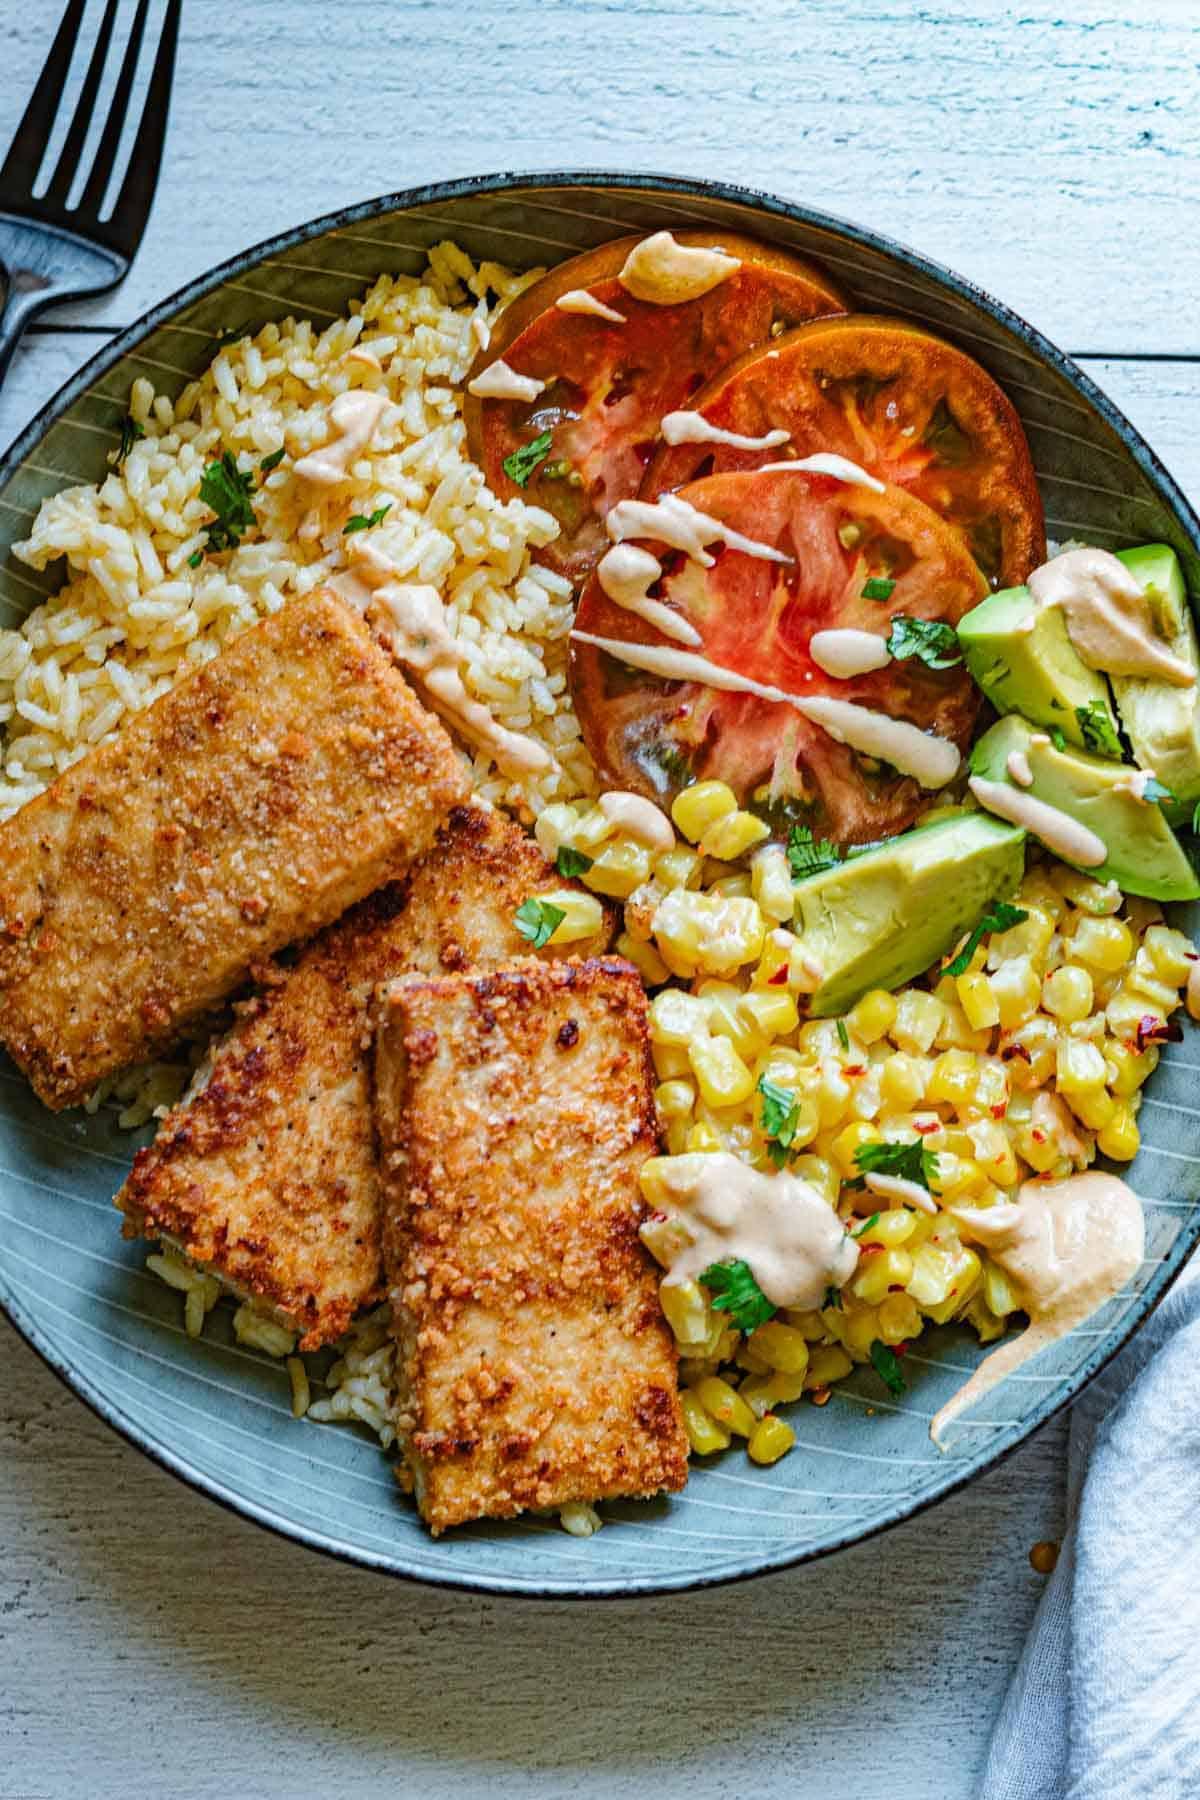 Crispy Tofu Bowl, Chipotle-Tahini, creamy sweet corn kernels, avocado, tomatoes, rice, and cilantro.